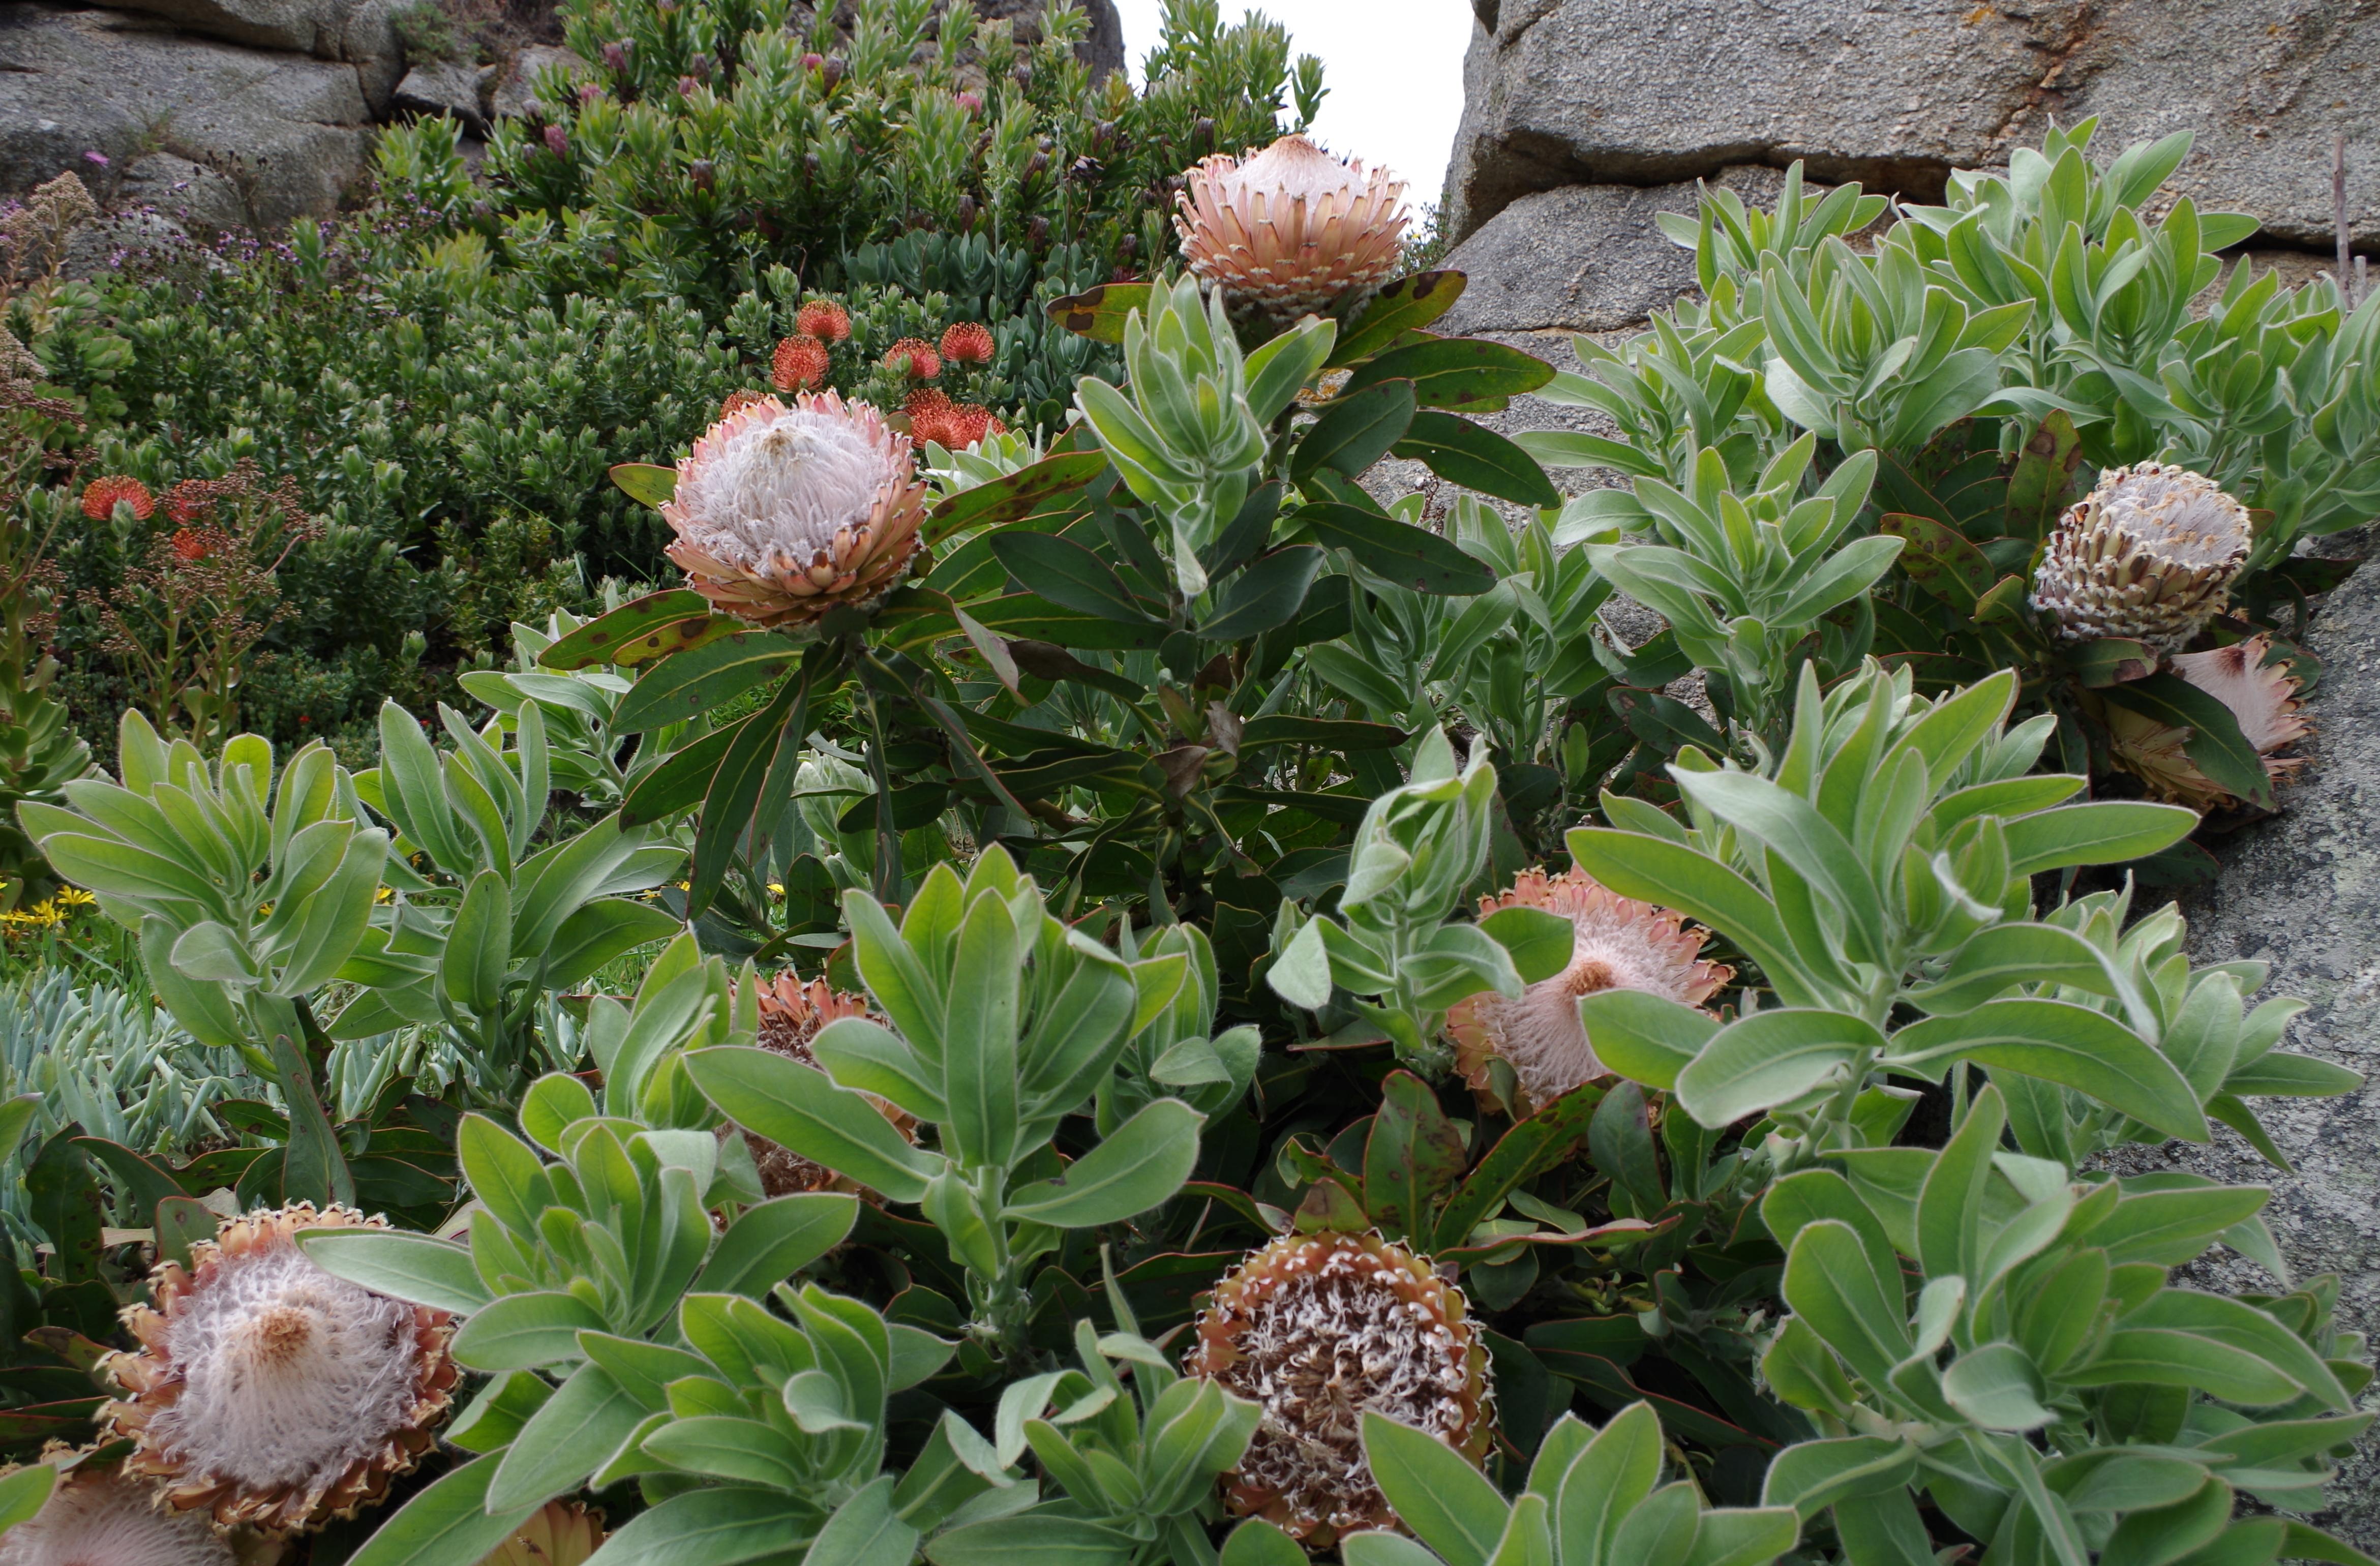 File protea jardin exotique de roscoff jpg wikimedia commons - Jardin exotique de roscoff paris ...